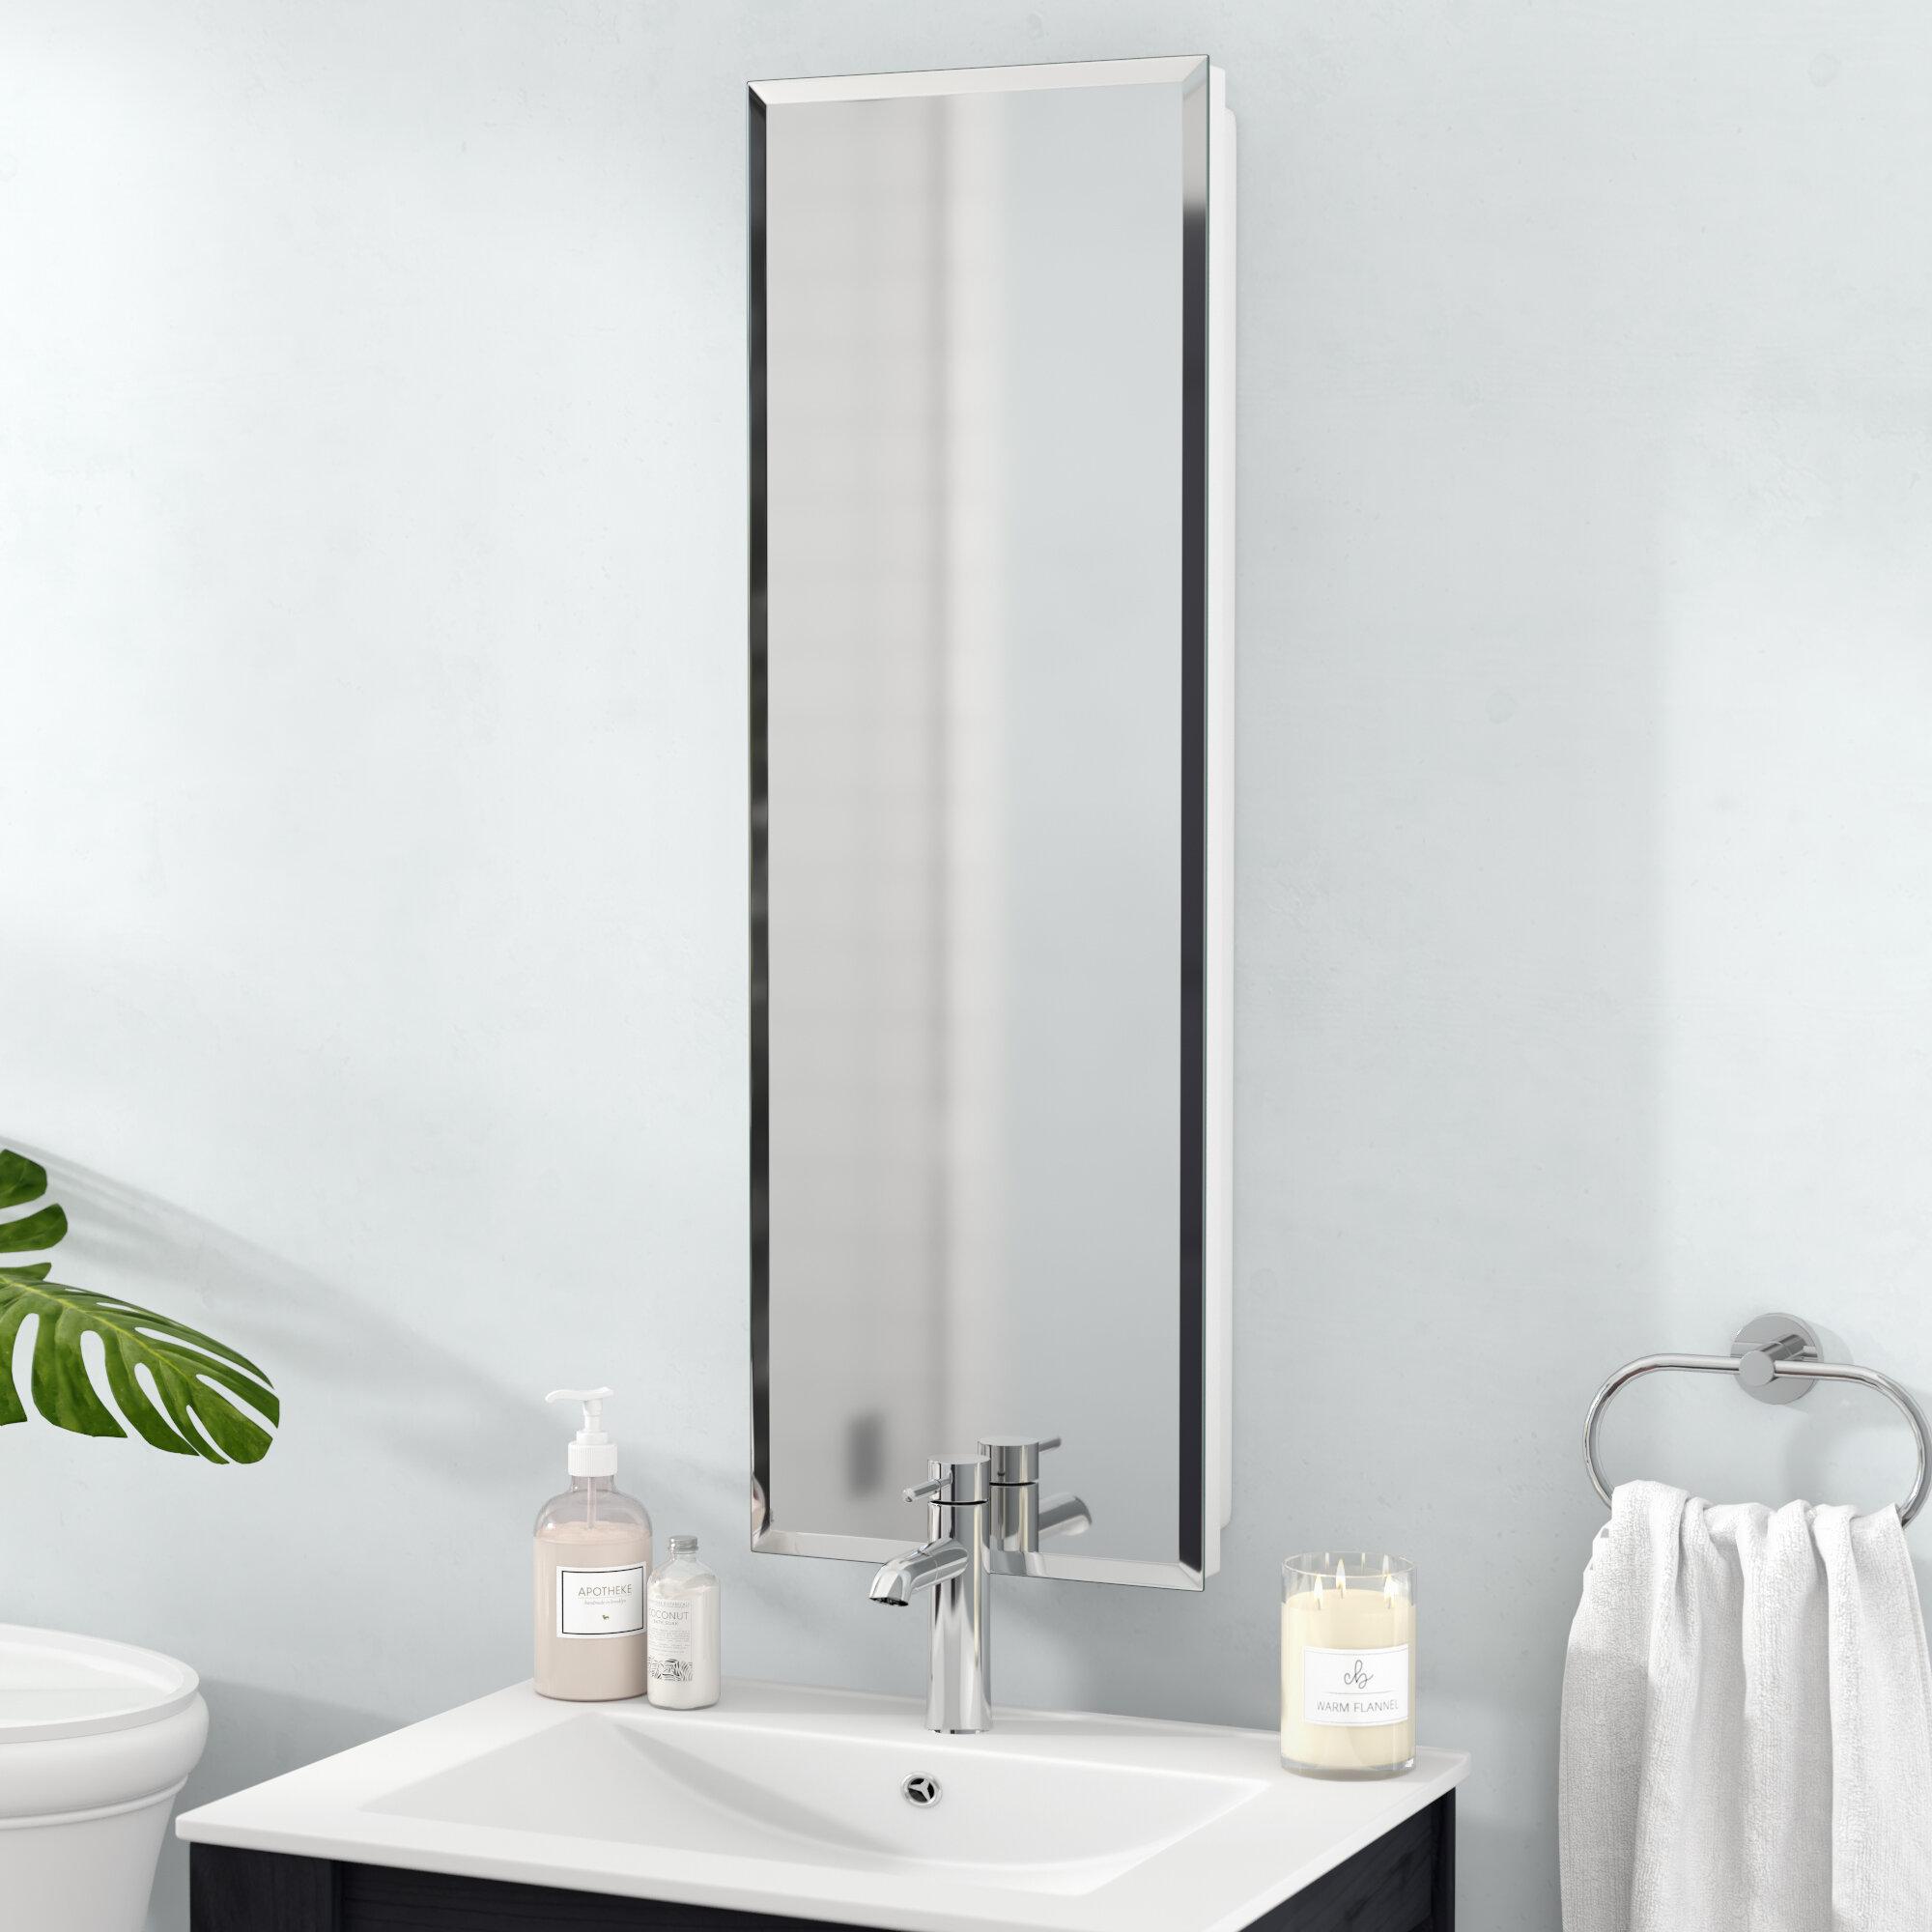 "Orren Ellis Ginnifer 12"" x 36"" Recessed Medicine Cabinet with 5 Adjustable Shelves & Reviews | Wayfair"